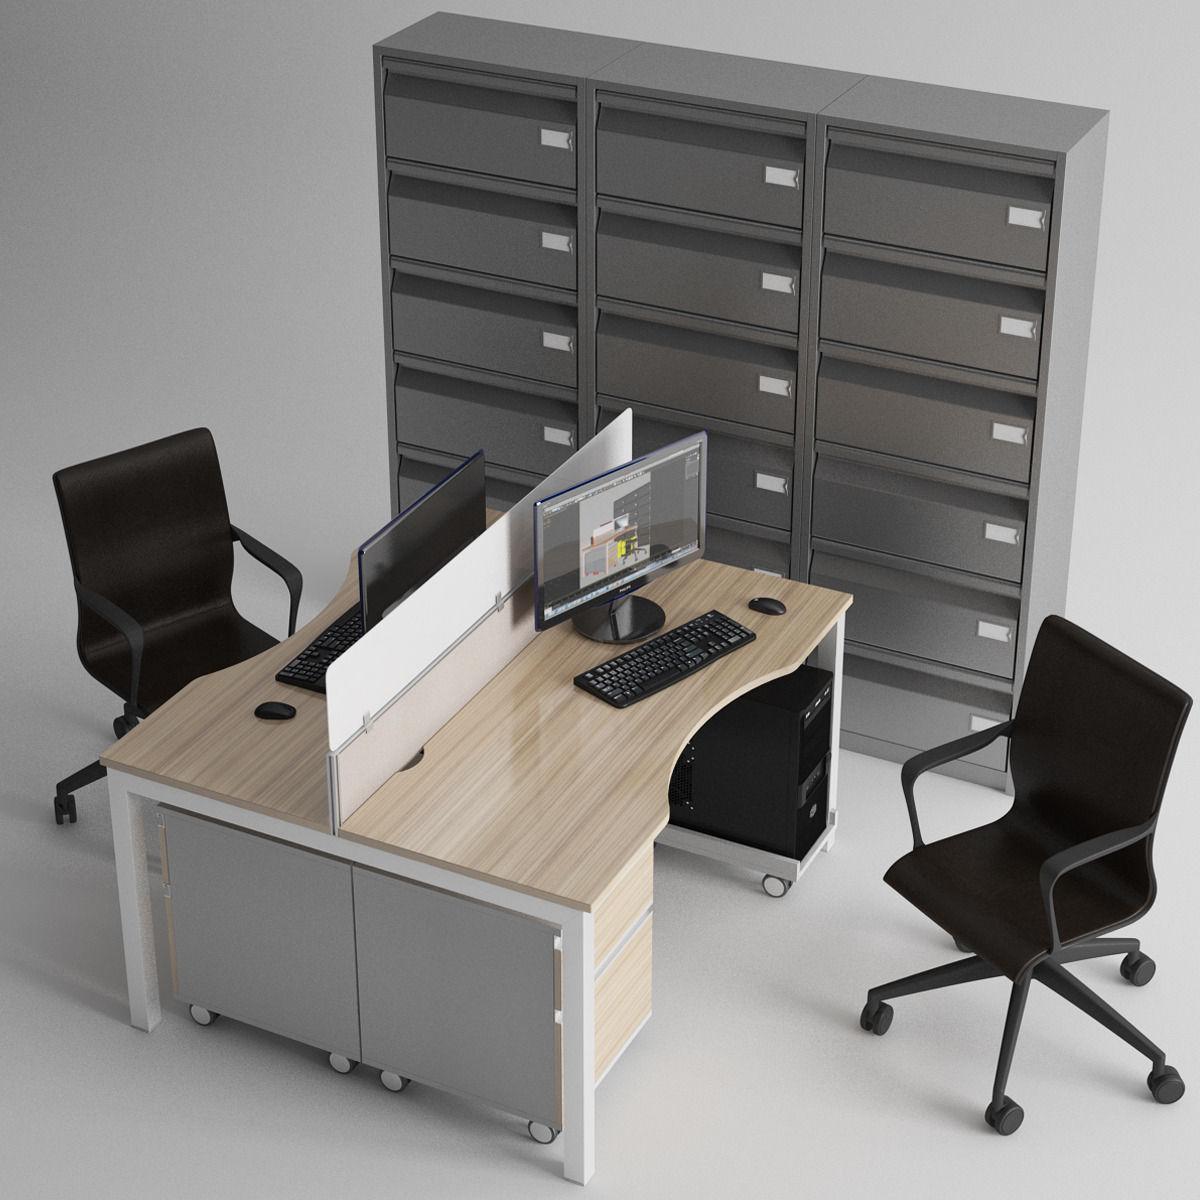 fice Furniture 3D Model MAX FBX